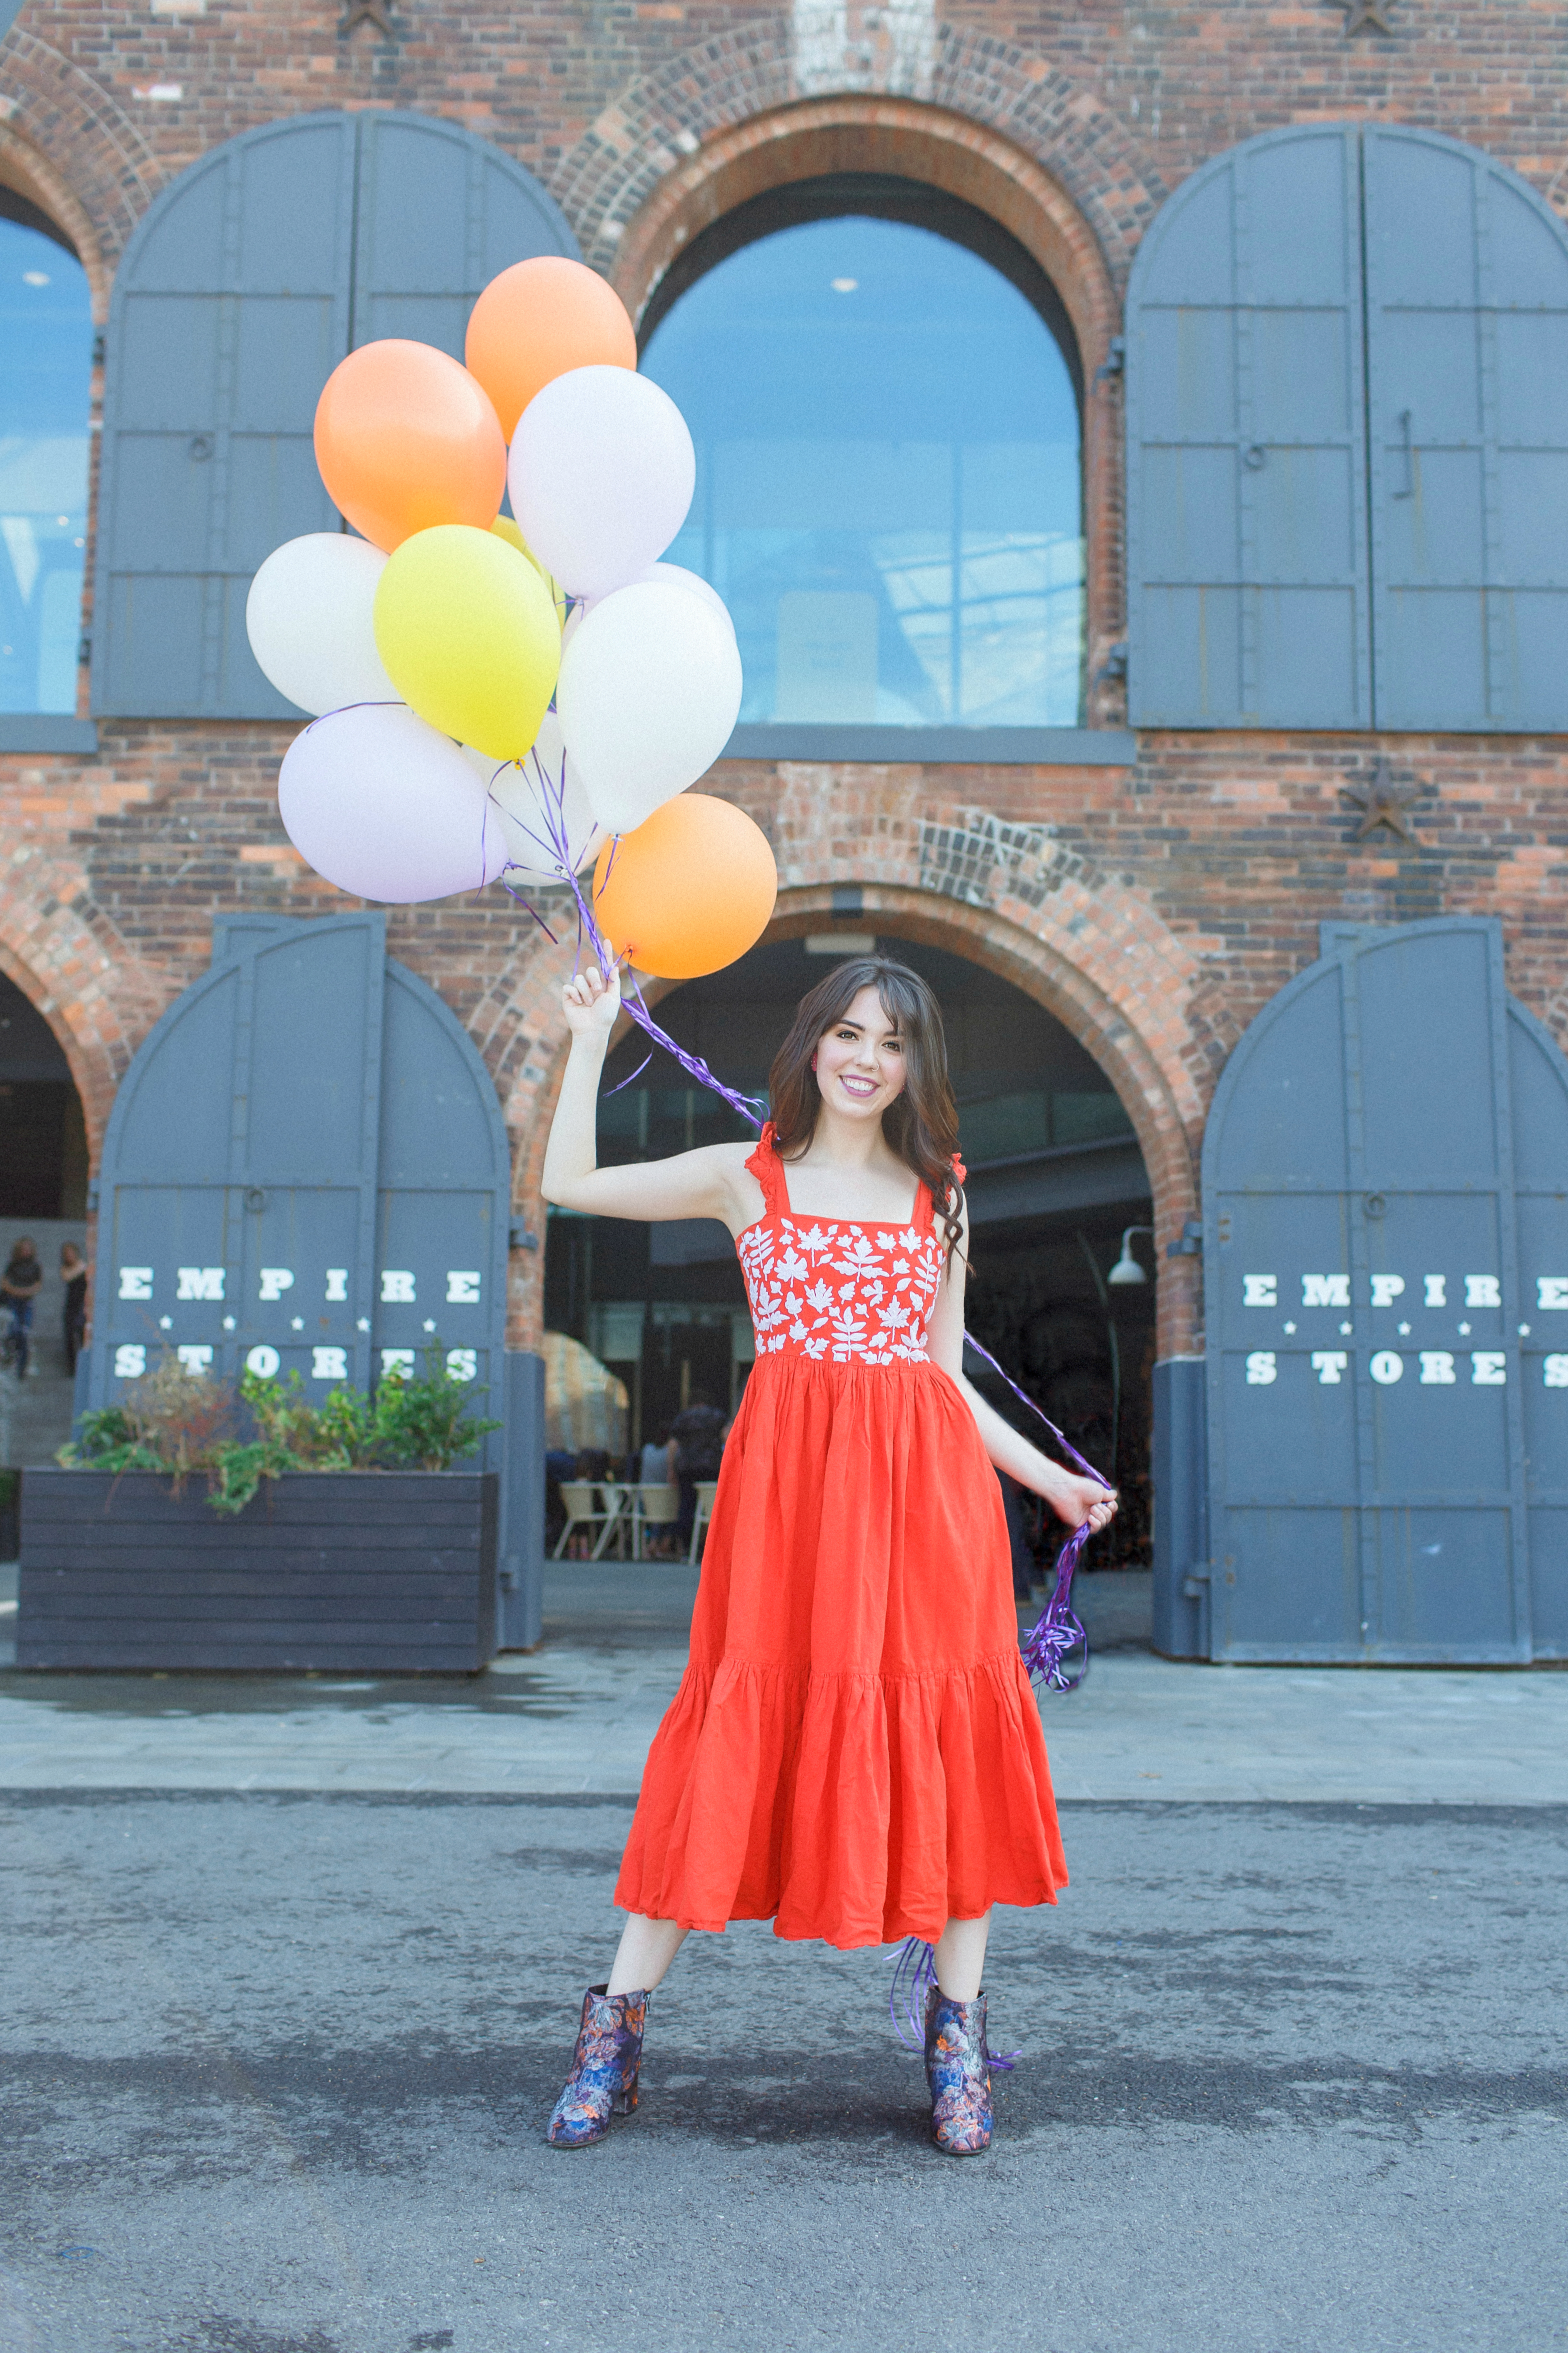 Lindsay likes Balloons